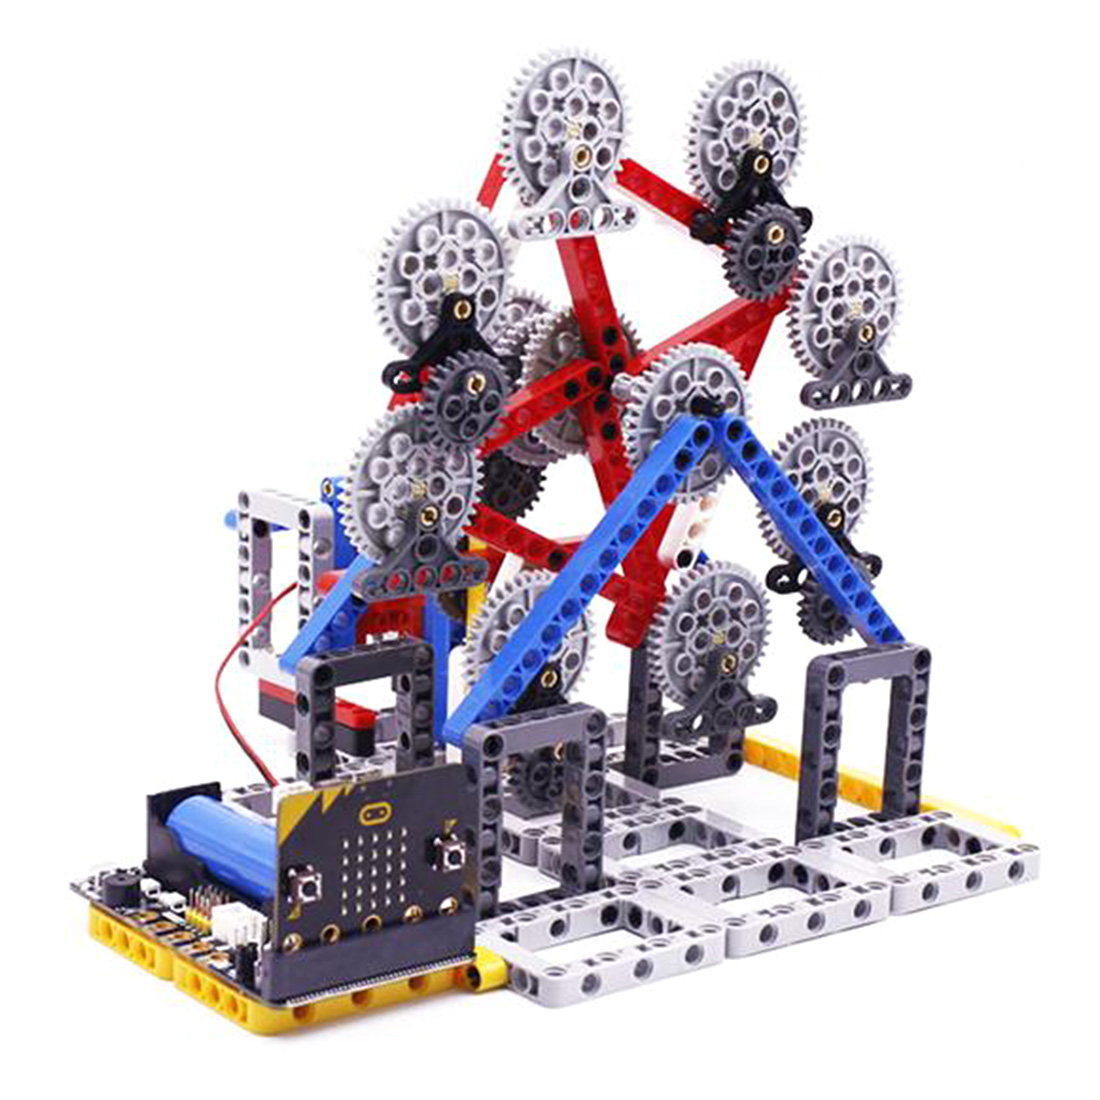 With Micro:Bit Programmable Toy Building Block DIY Smart Ferris Wheel Kit Programable Toys For Men Kids Gift - Random Color